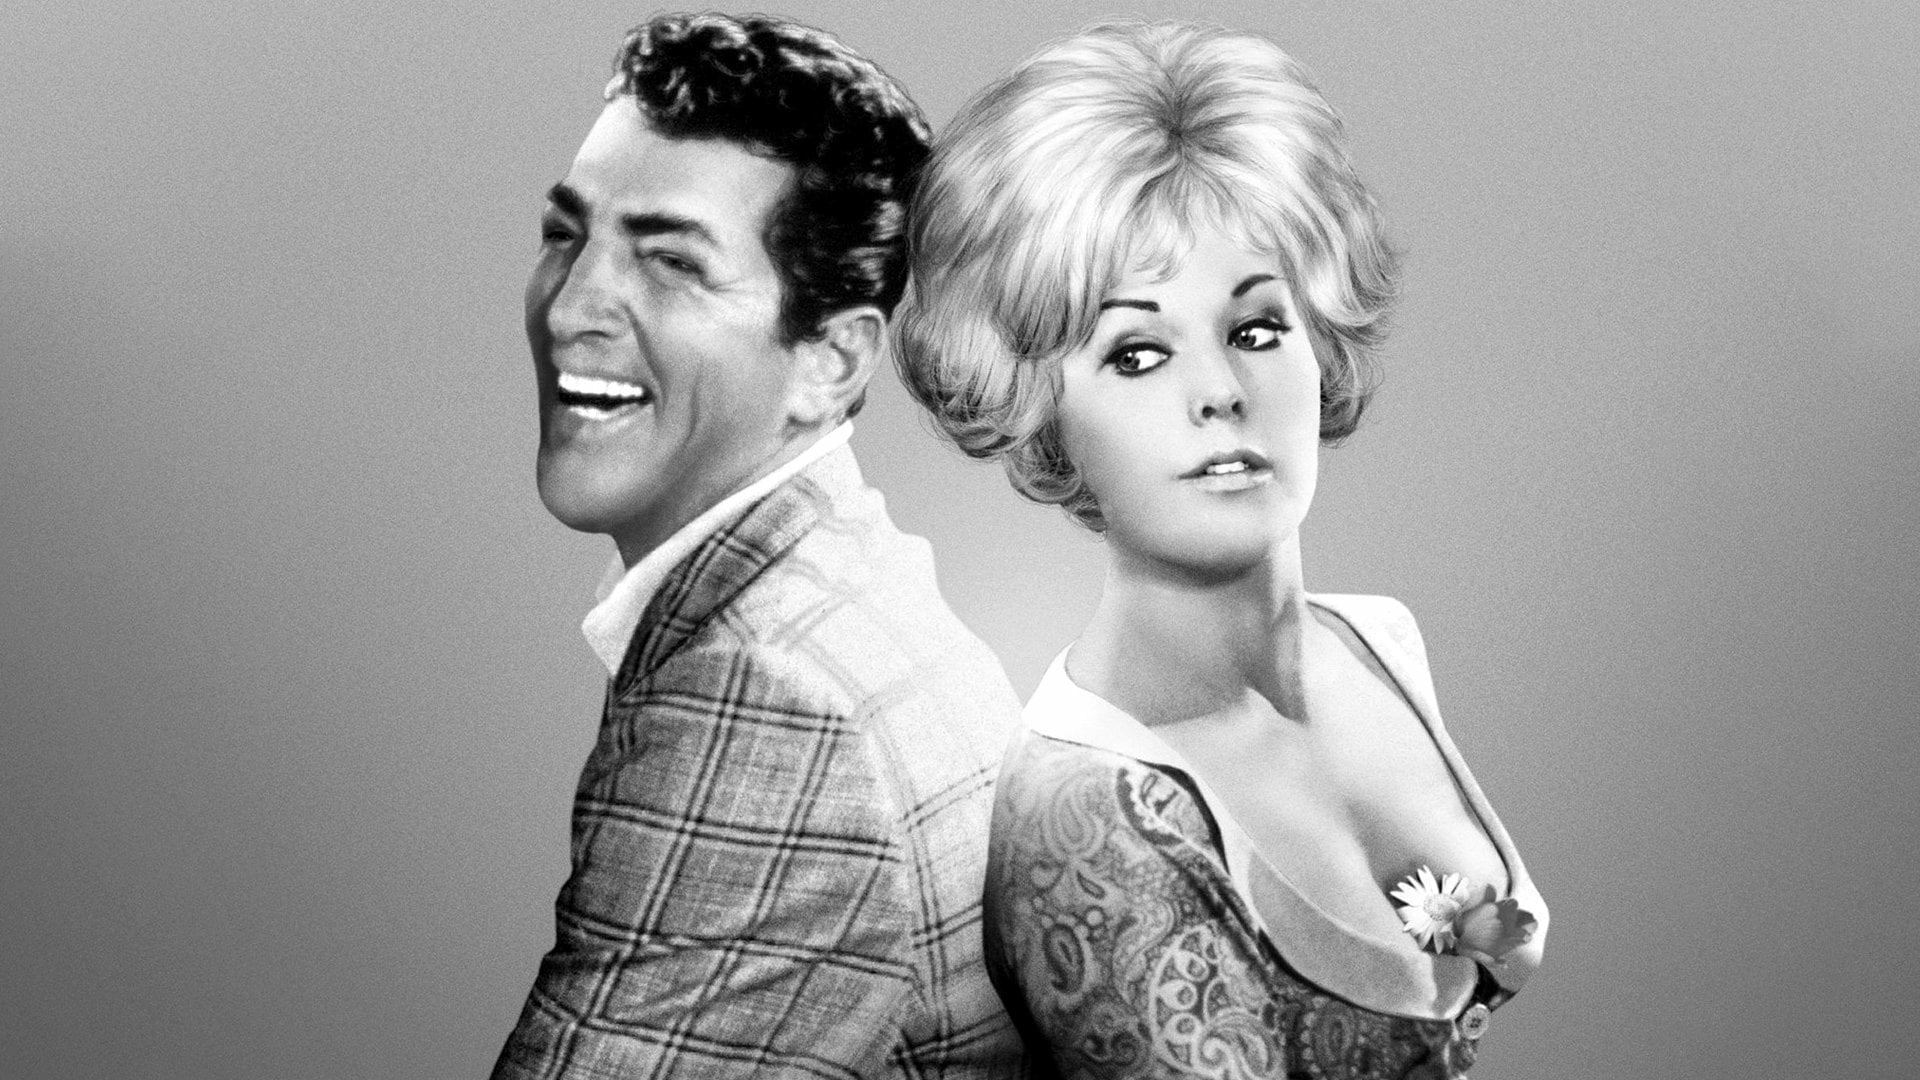 Кадры из фильма Поцелуй меня, глупенький Kiss Me, Stupid 1964